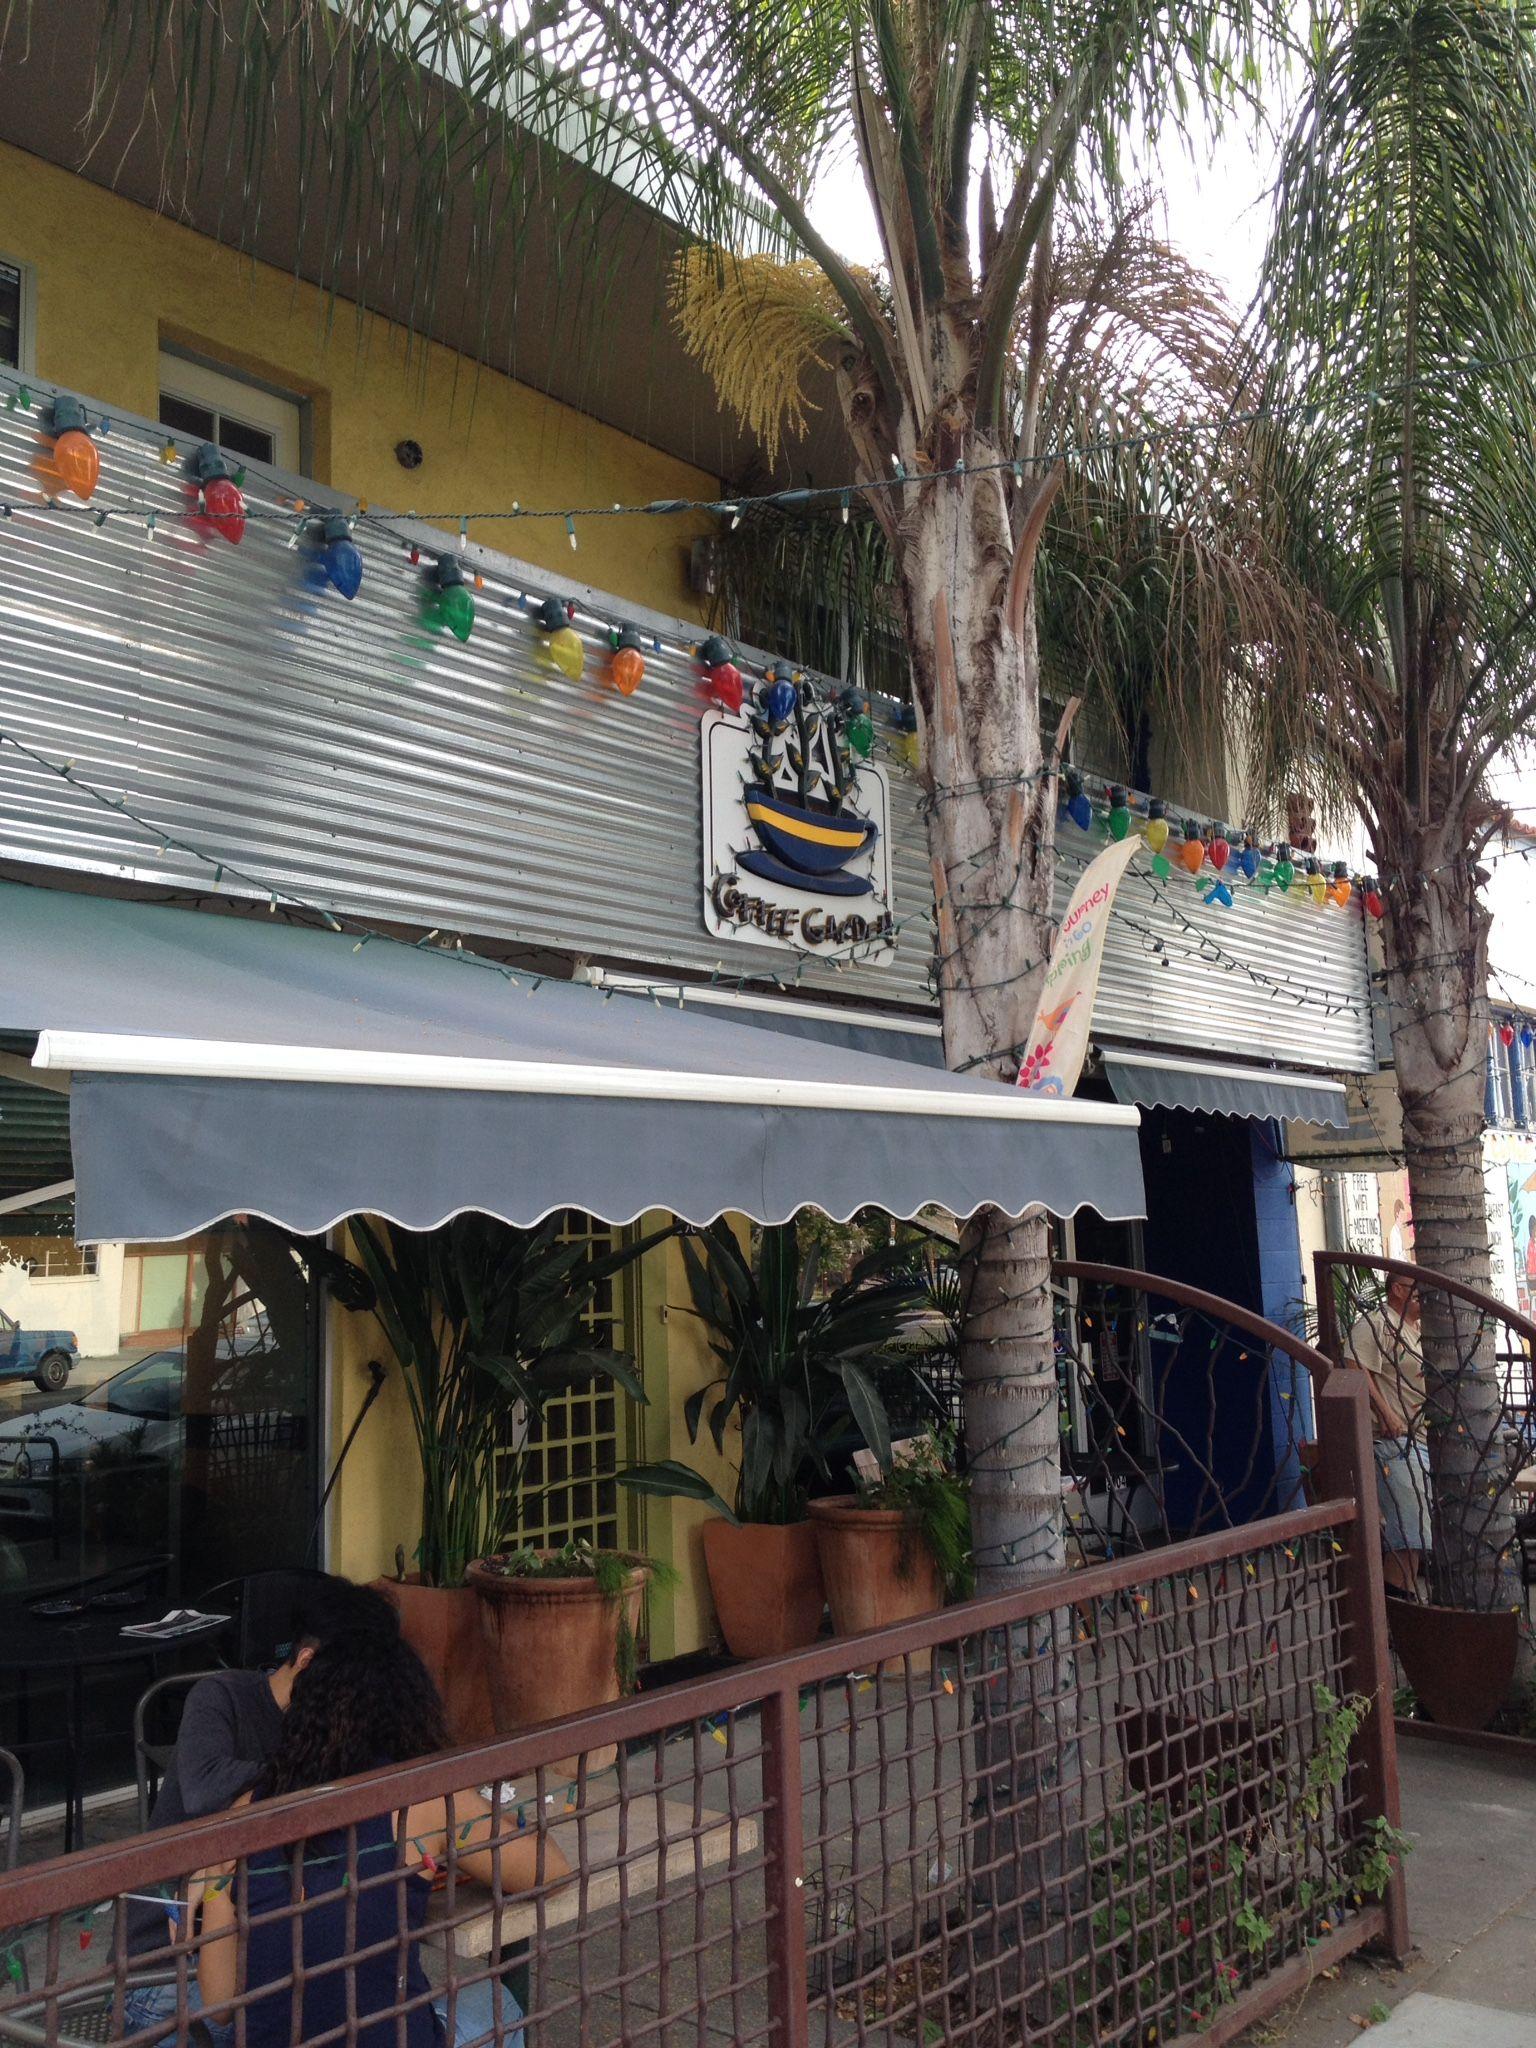 The Coffee Garden on Franklin Blvd. just kitty corner from